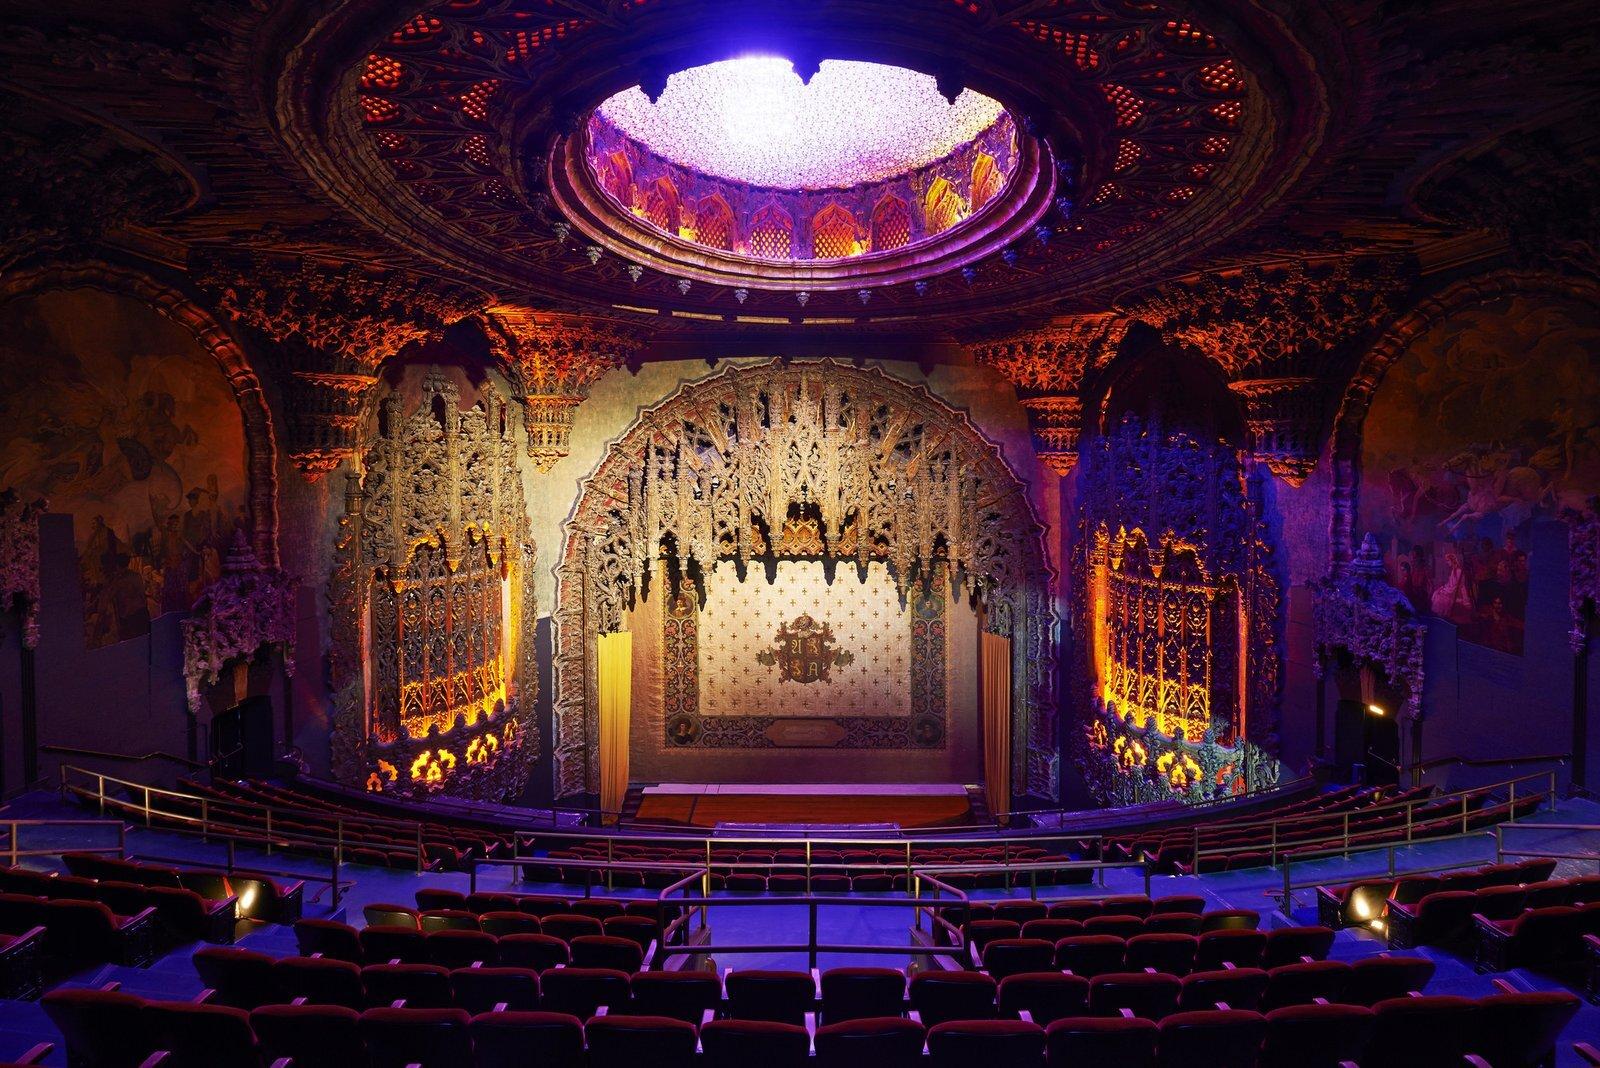 TheatreatAceHotel_PHOTO.jpg